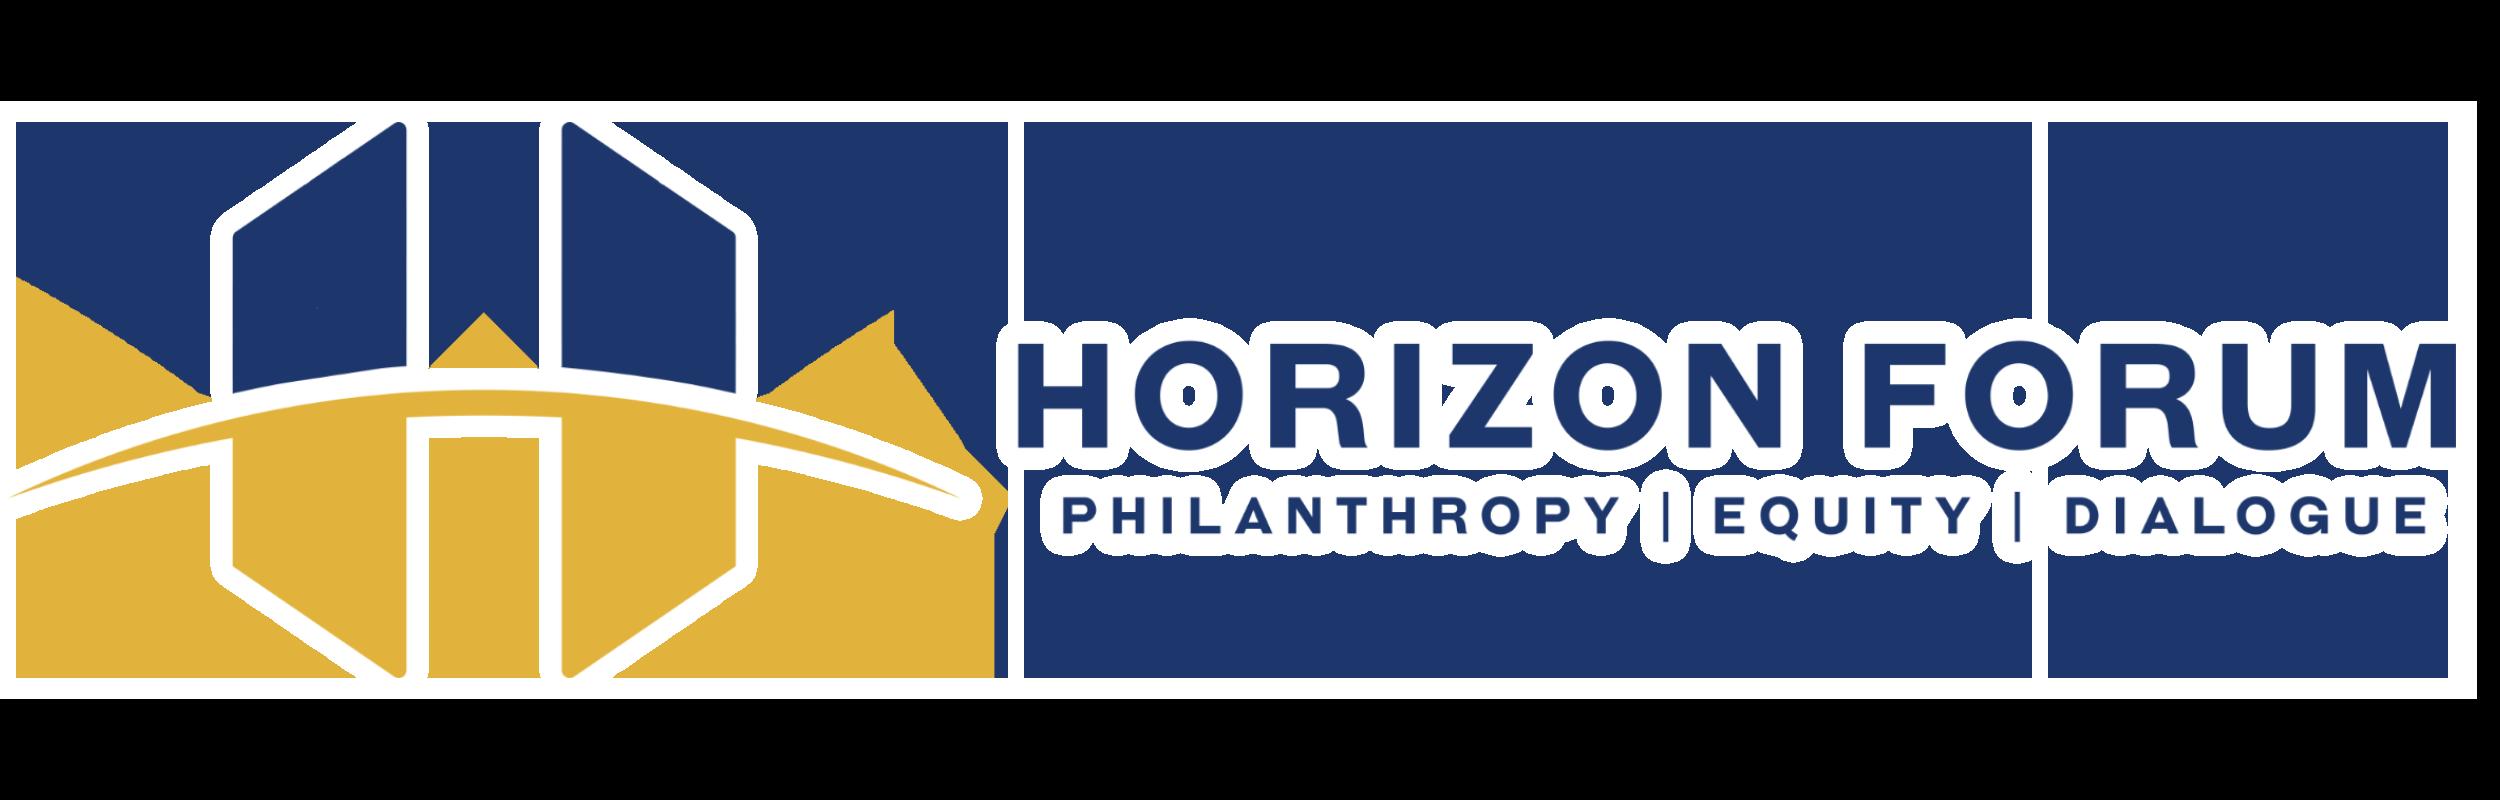 Horizon Forum